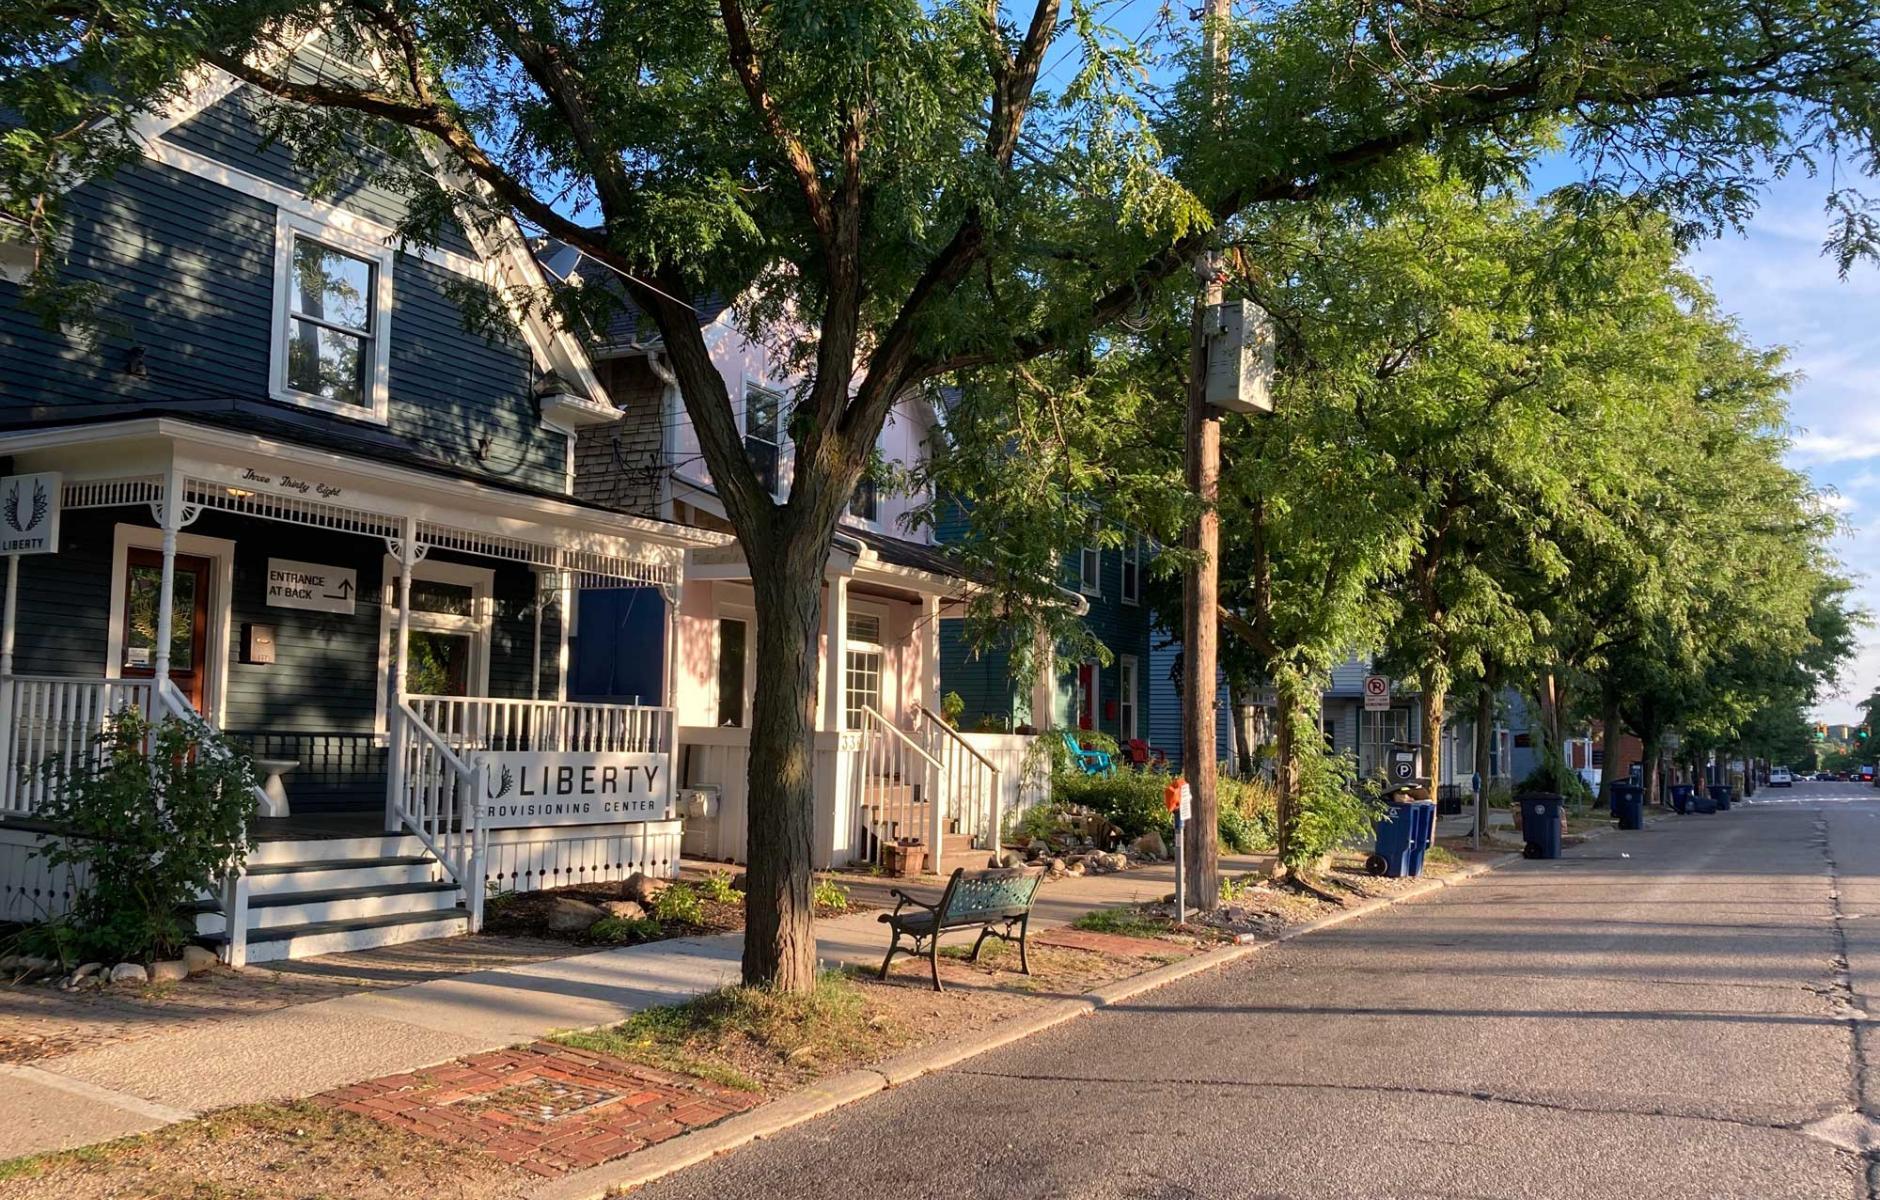 Creating livable Workshop Neighborhoods | CNU